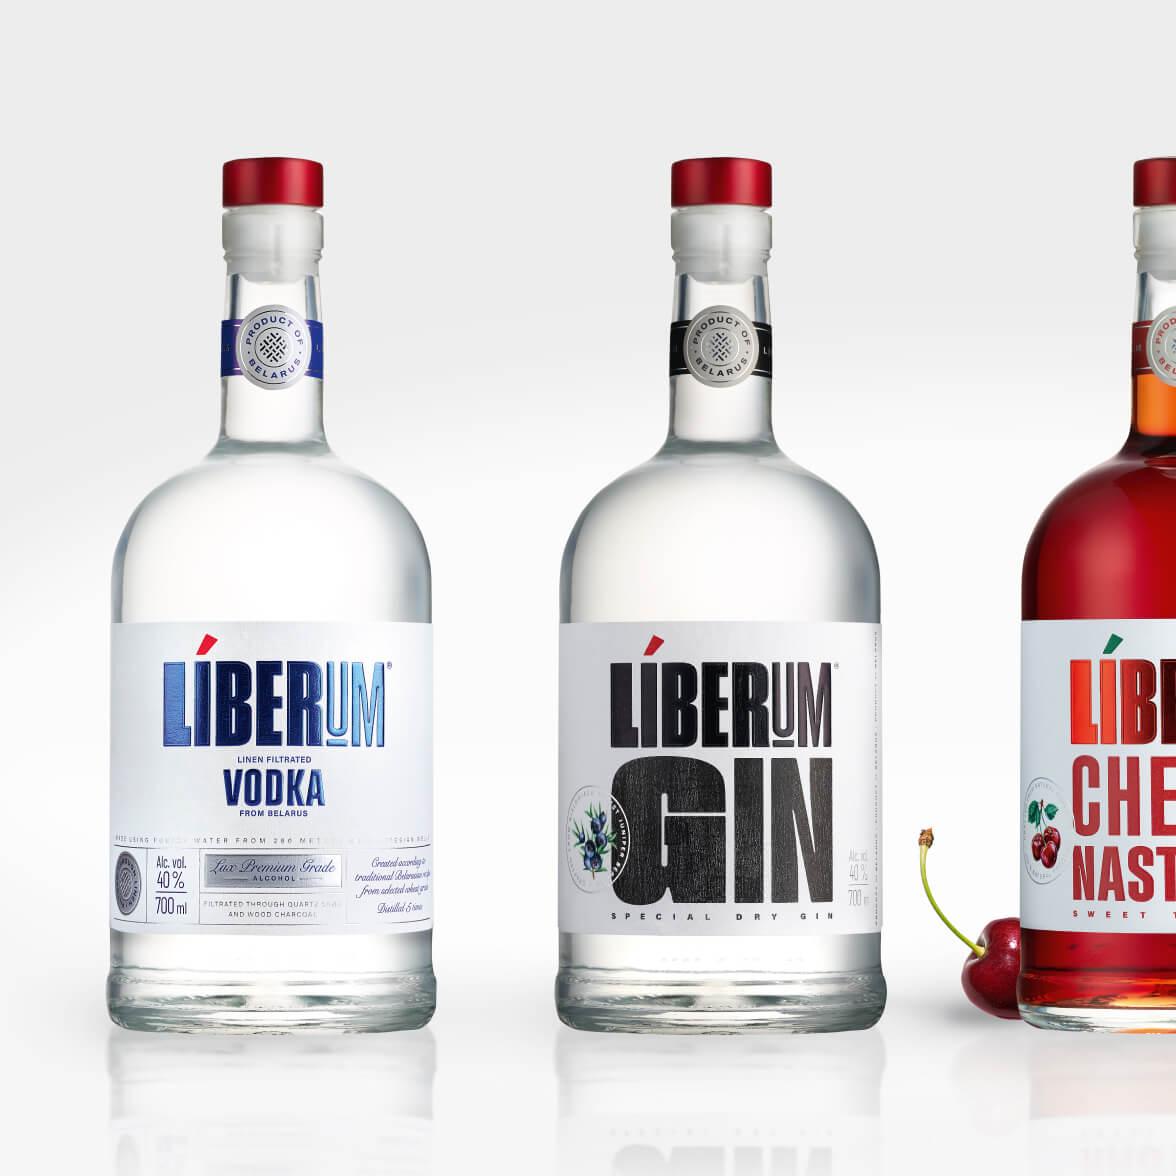 Liberum - bottle and label design